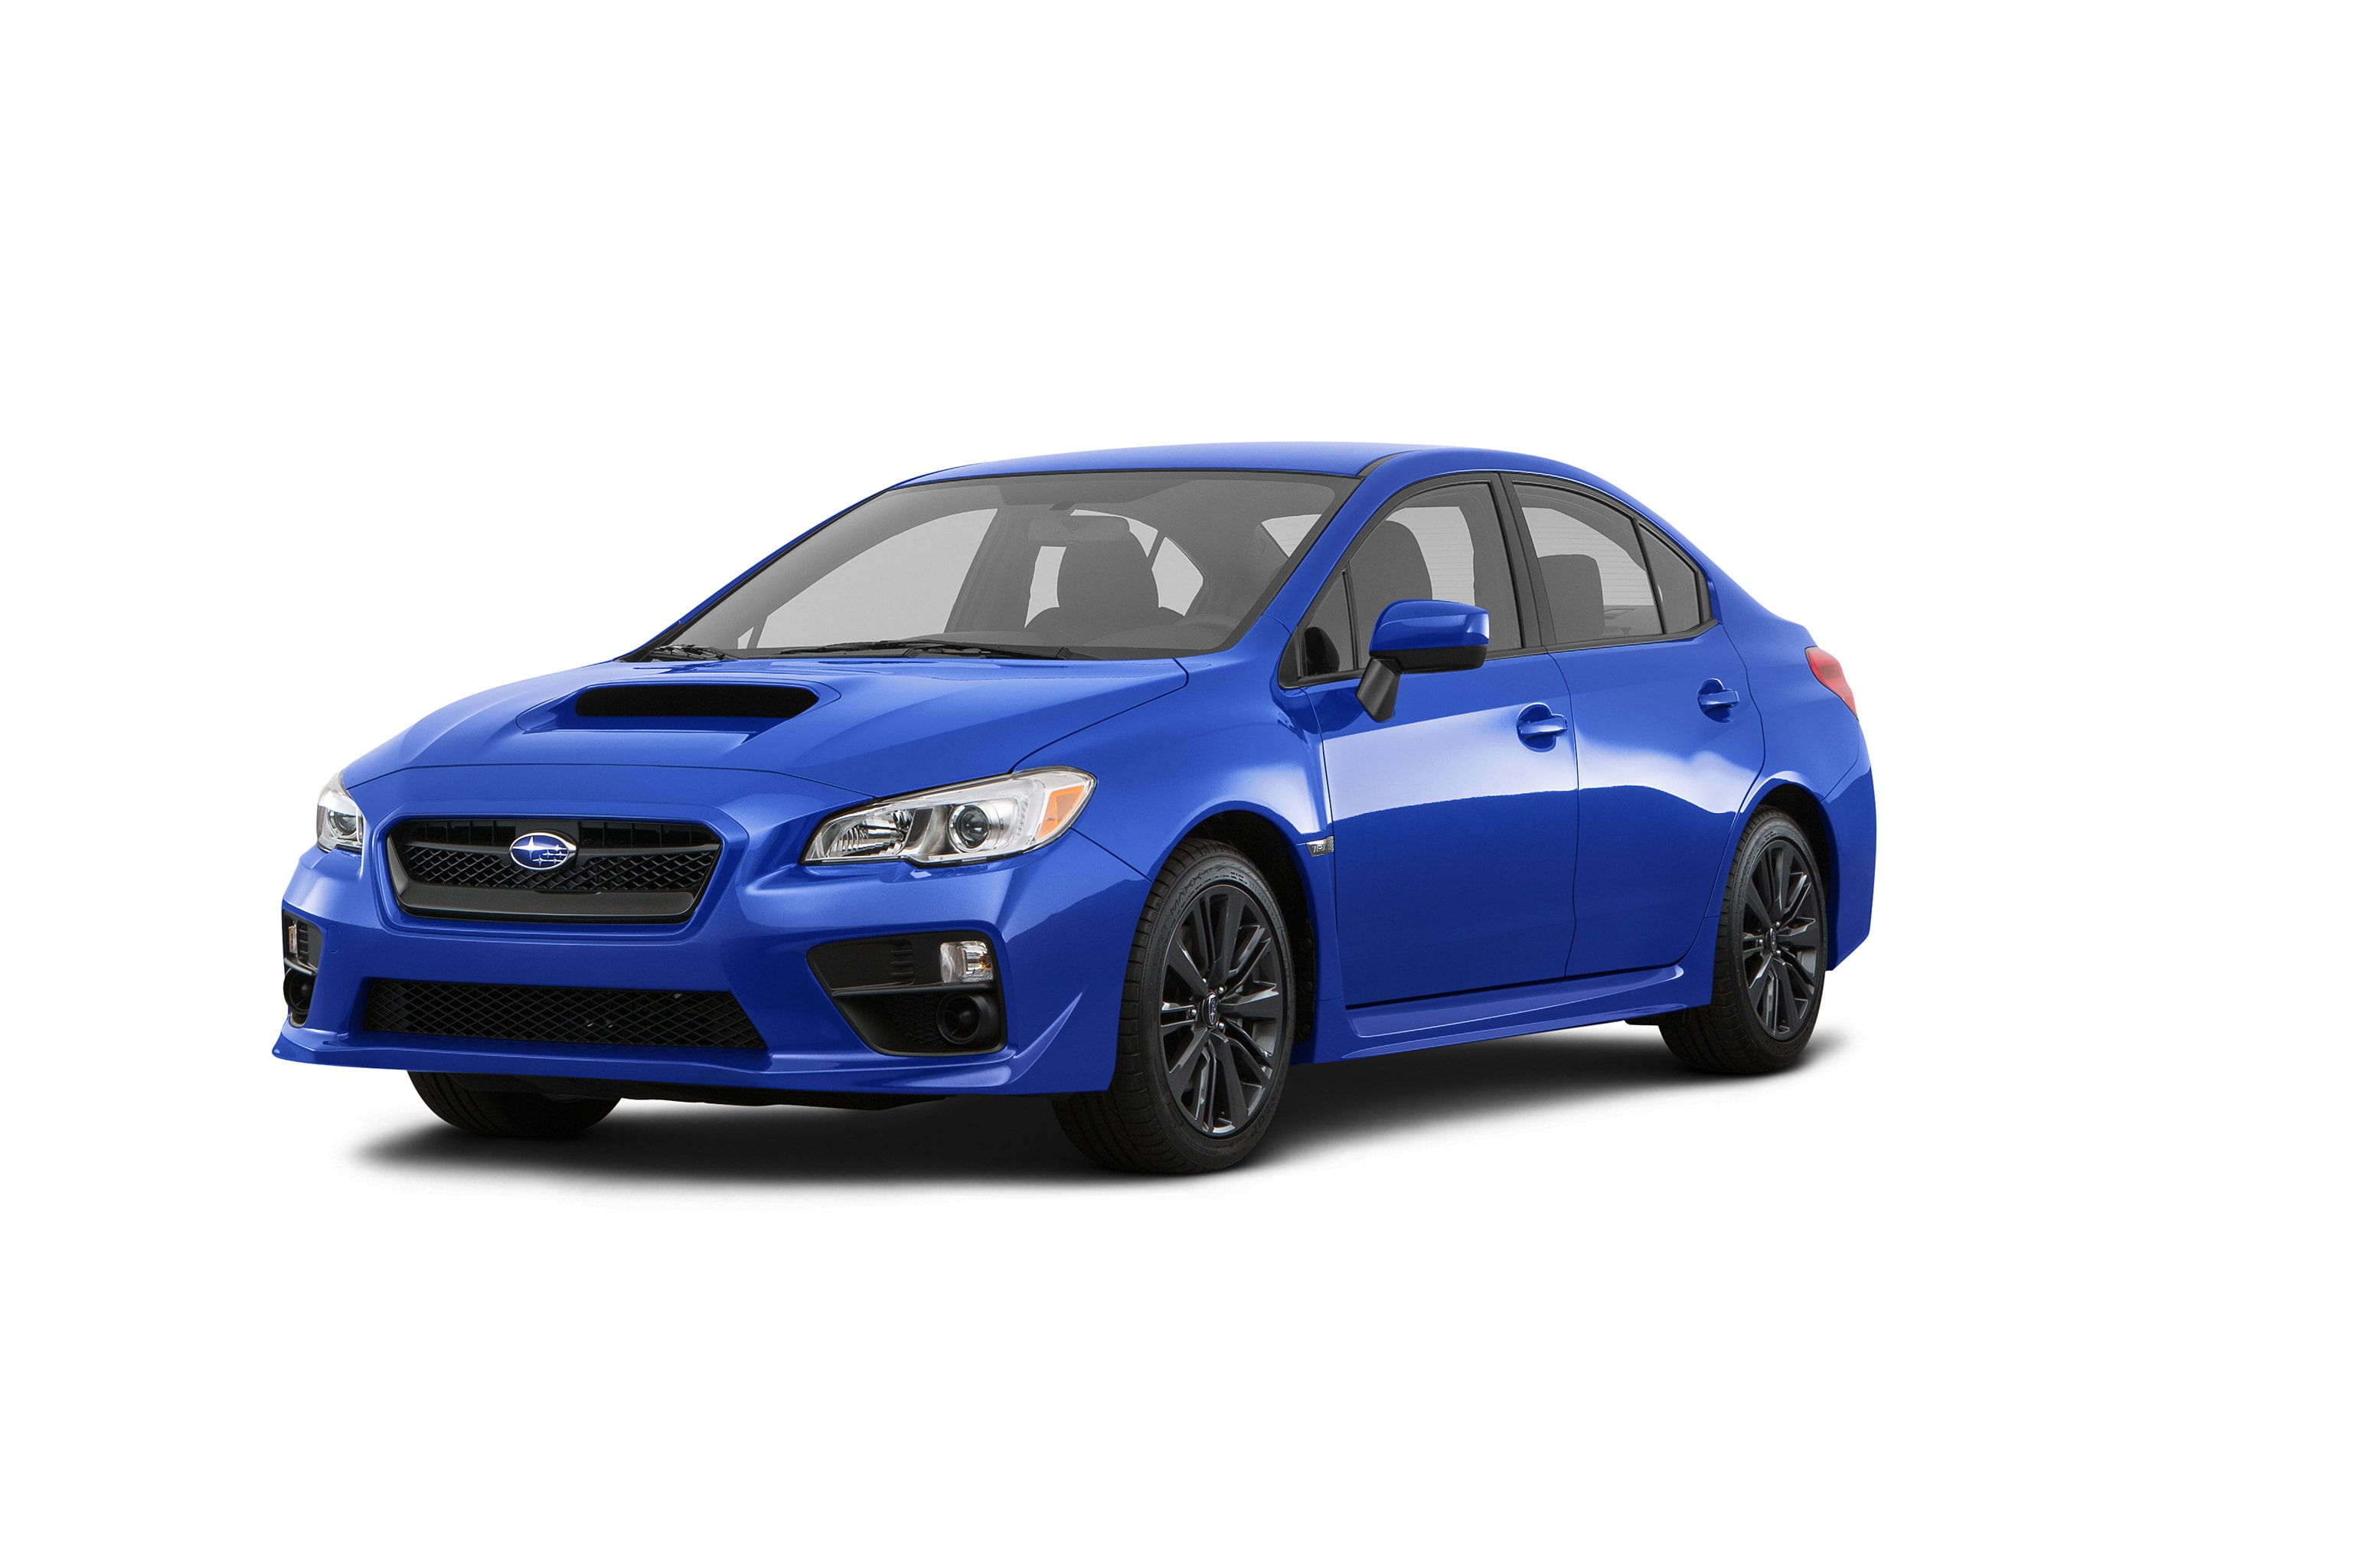 New Motors Subaru Erie Pa >> New WRX STI | New Motors Subaru | in Erie, PA | Serving Jamestown, NY, Edinboro & Ashtabula